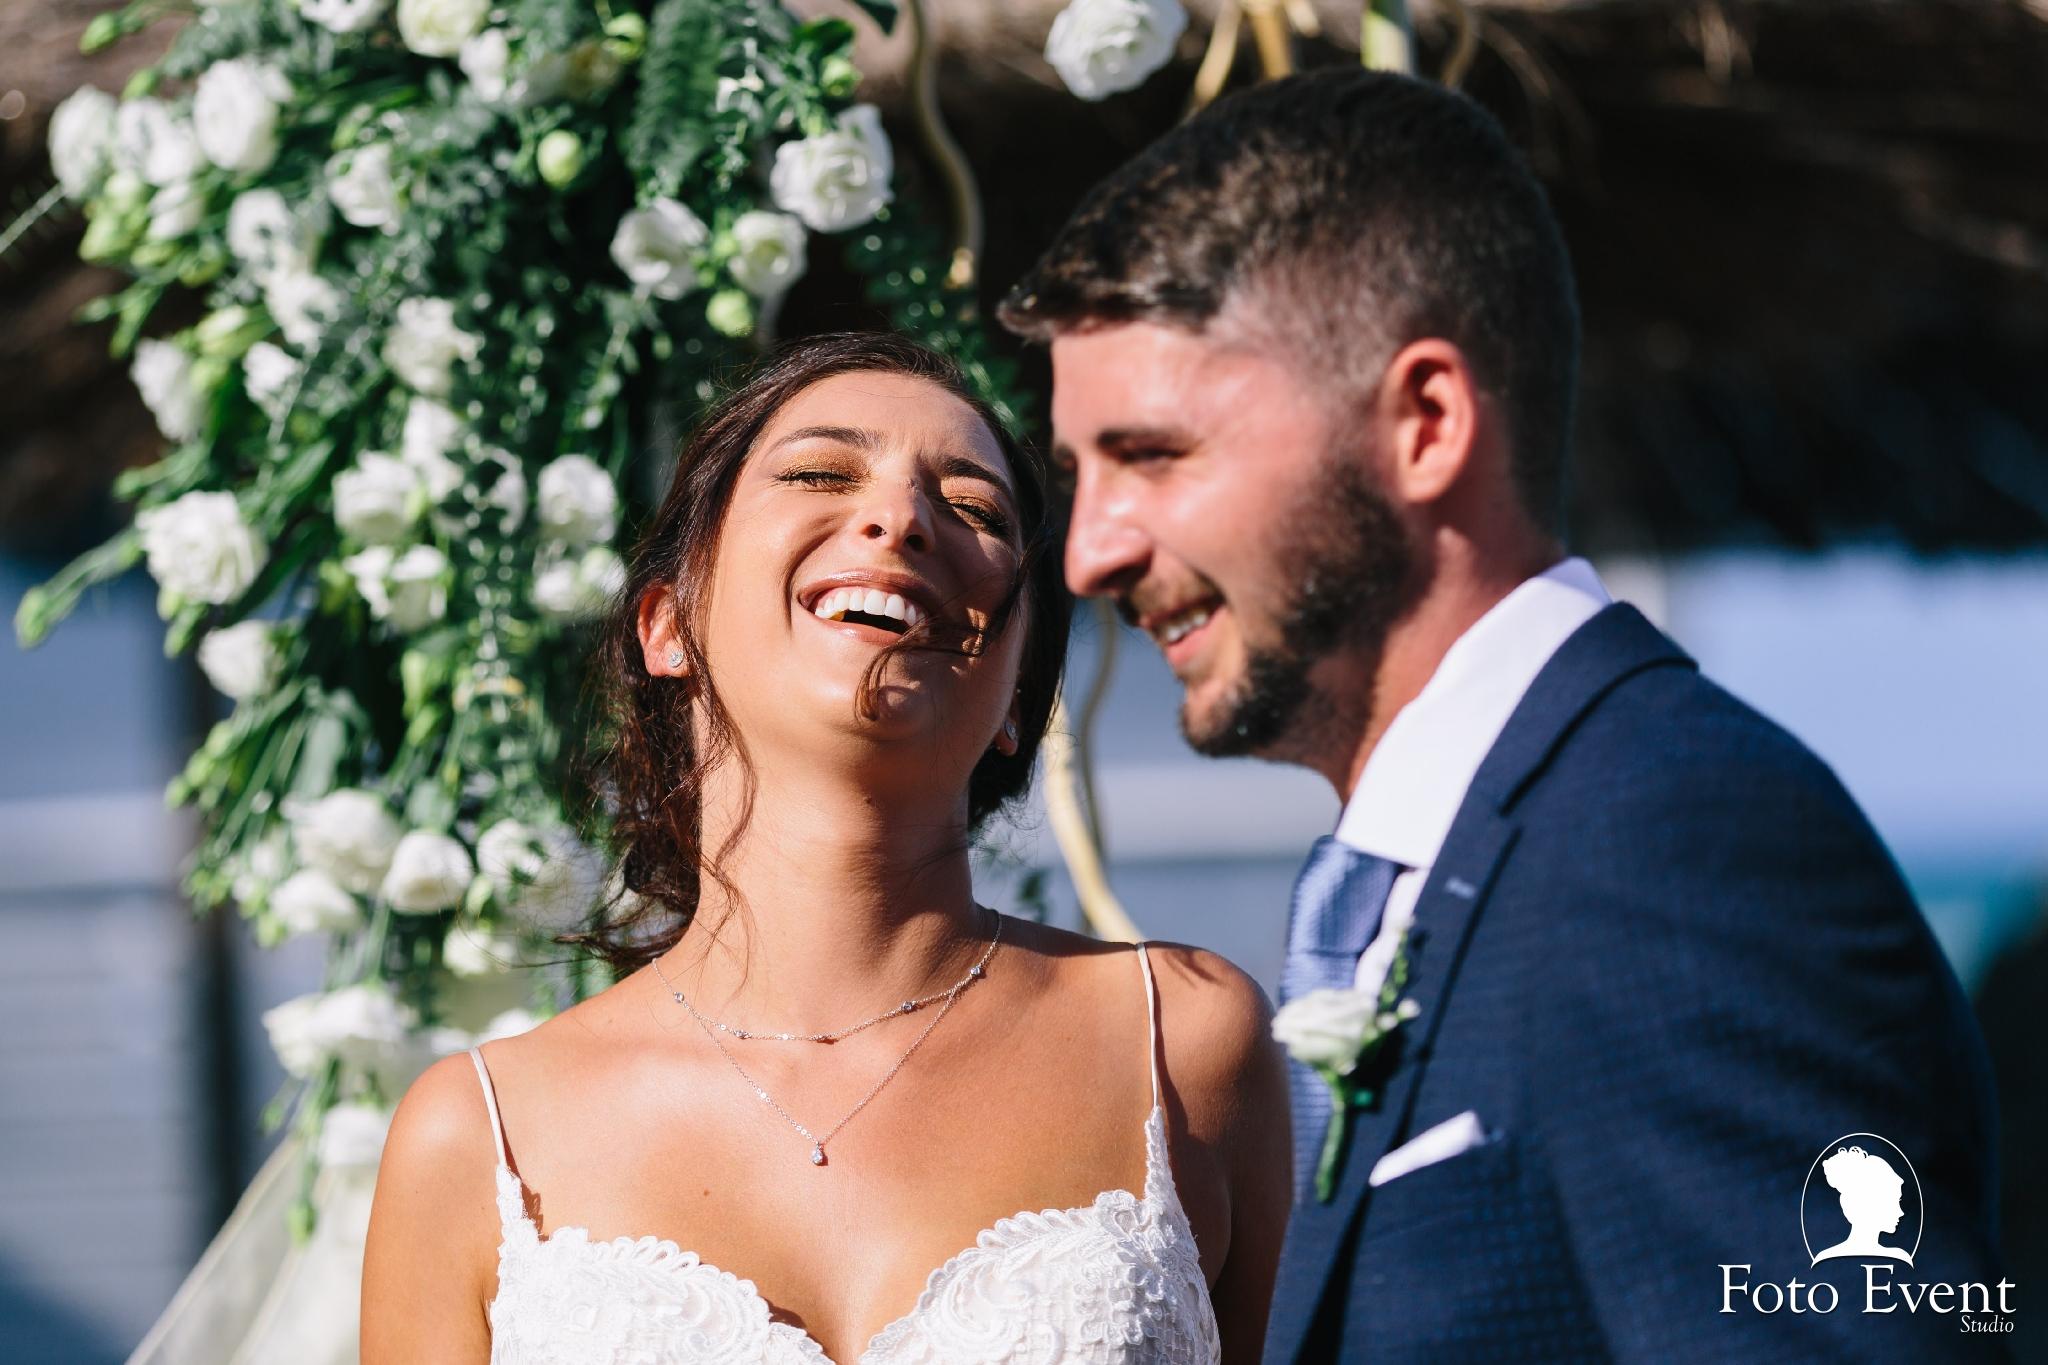 2018-09-25 Matrimonio Jessi e Simon Milligan zoom 105